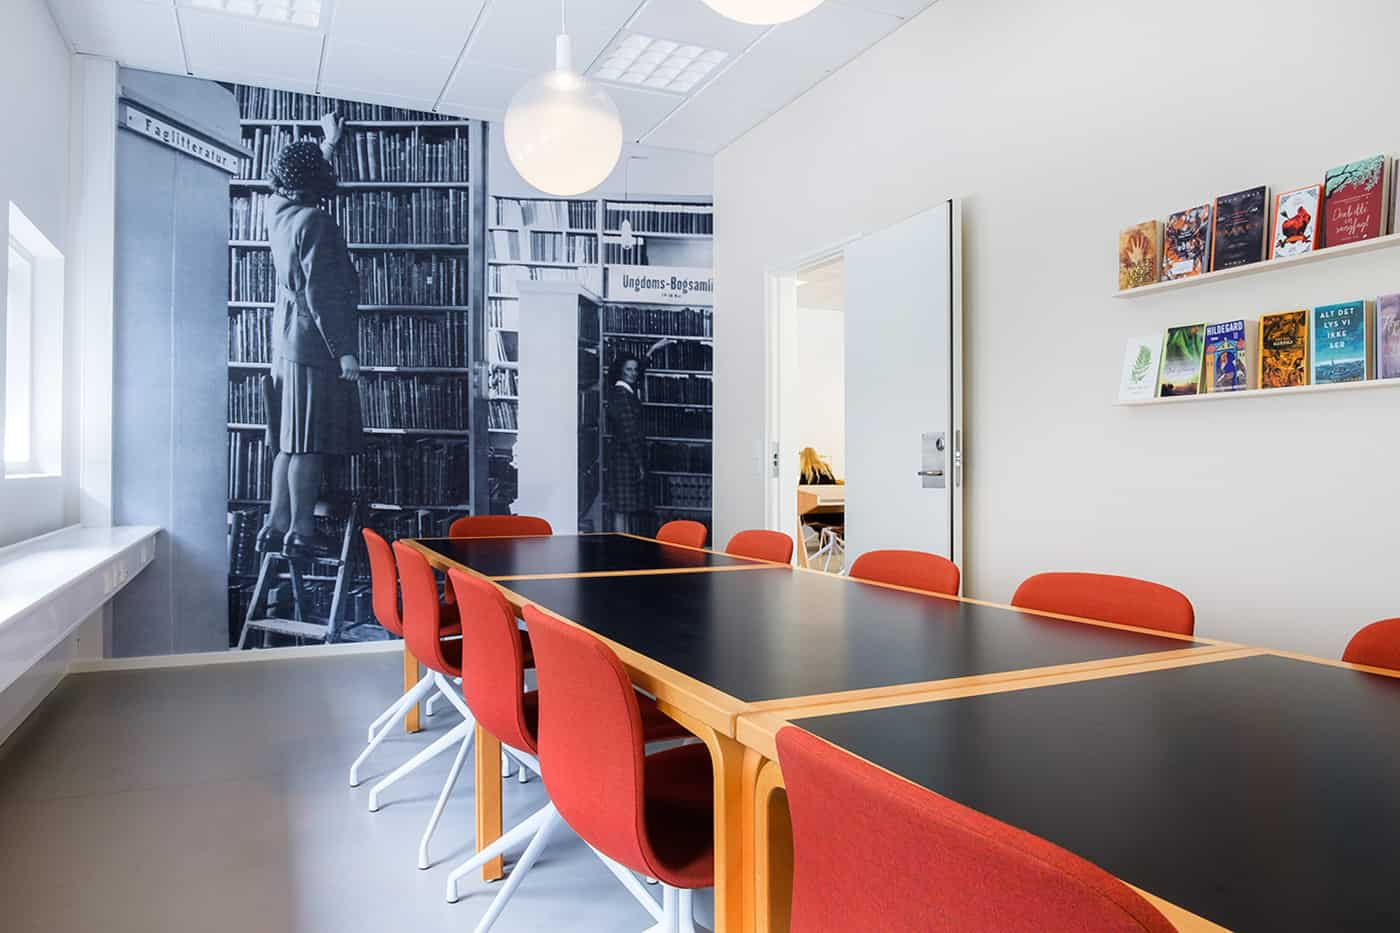 RITAarch, Indretning, spaceplanning, biblioteksdesign, biblioteksindretning, wayfinding, grafik, spaceplanning, arkitektur, mødelokale, holbæk bibliotek